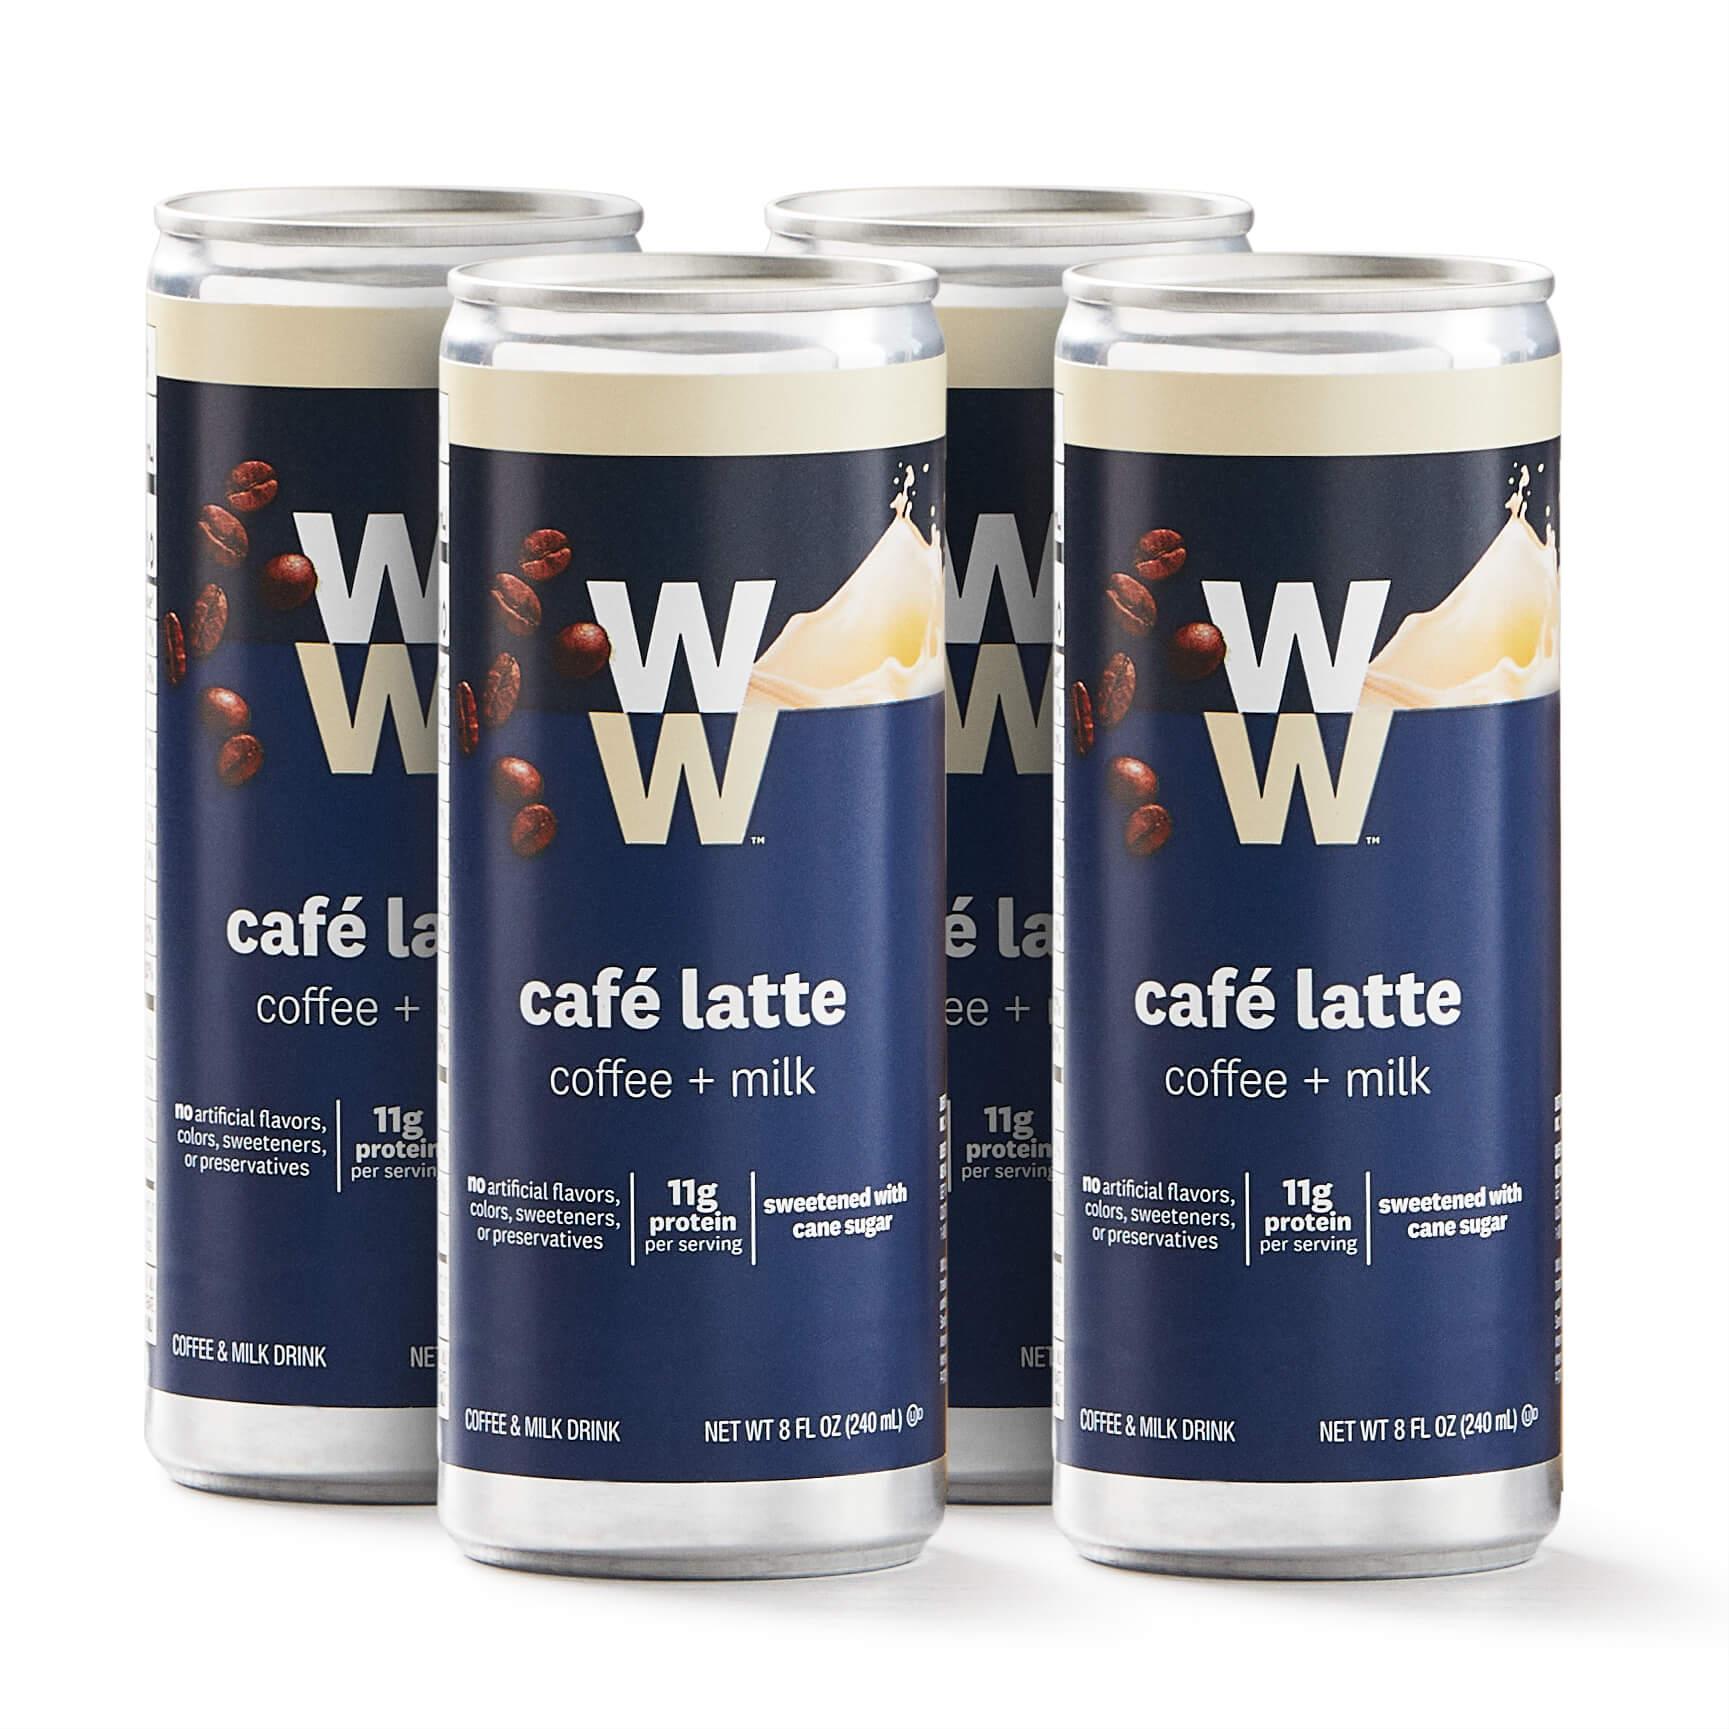 Cafe Latte - 4 cans